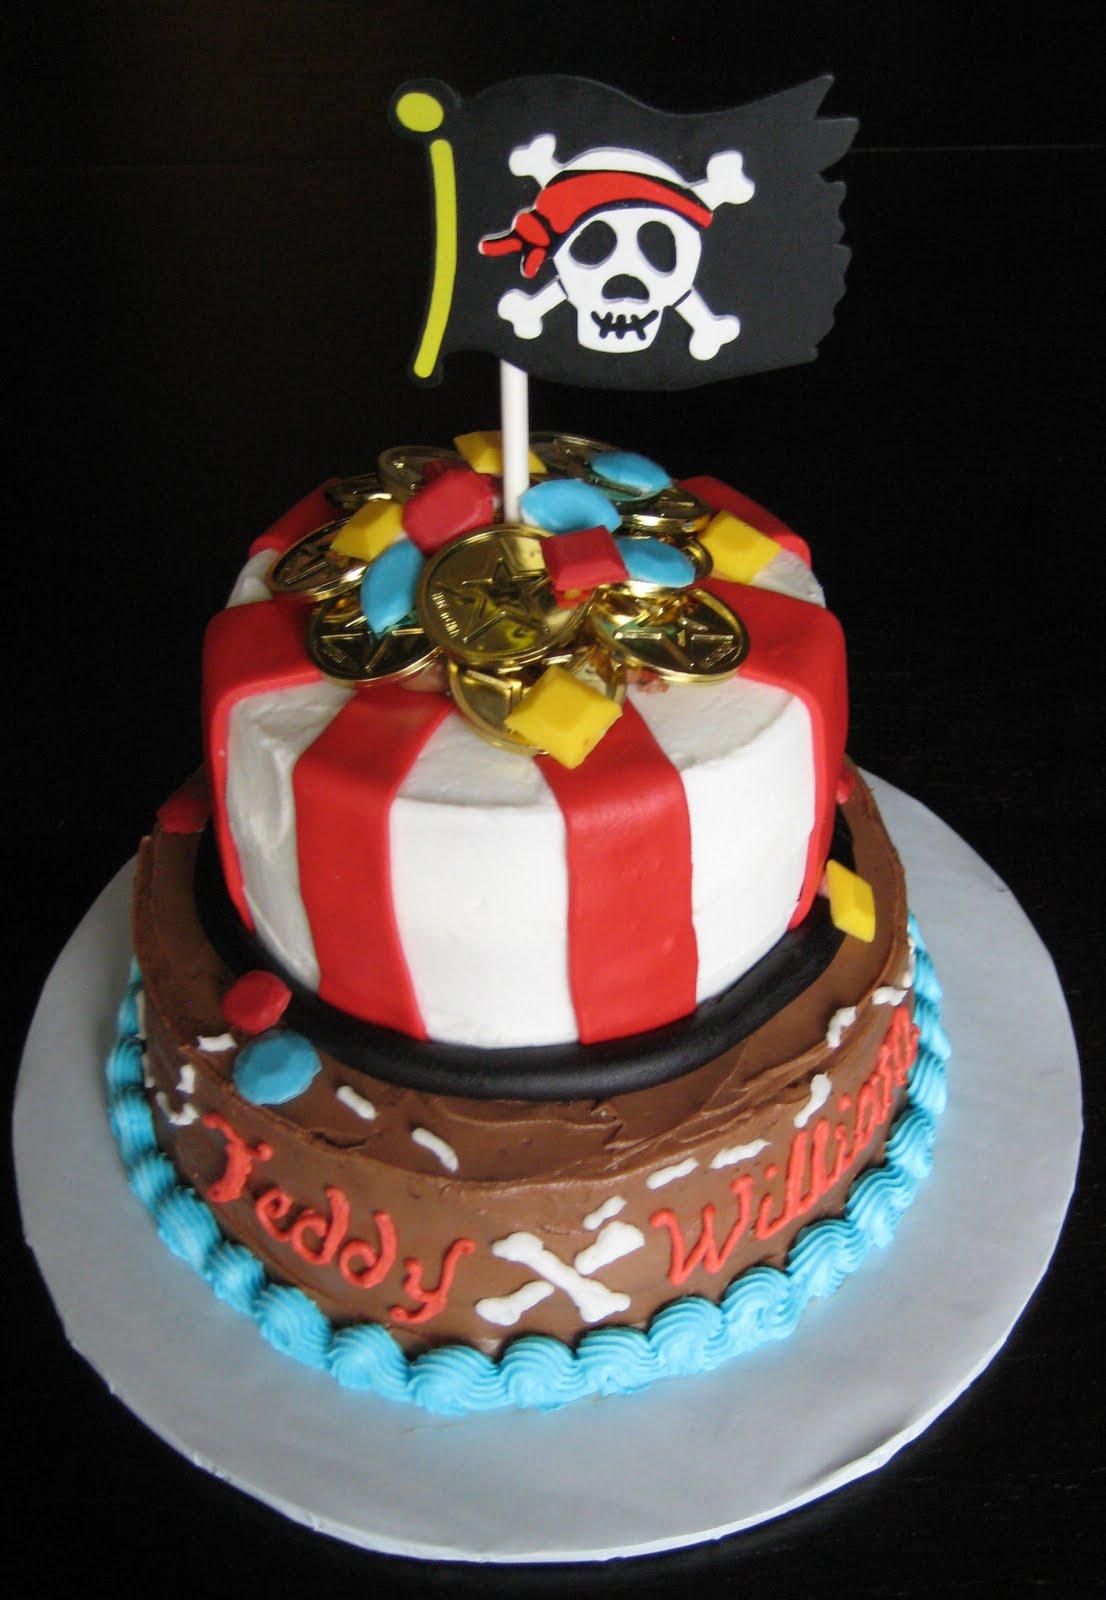 Cake Design Themes : Pirate Cakes   Decoration Ideas Little Birthday Cakes